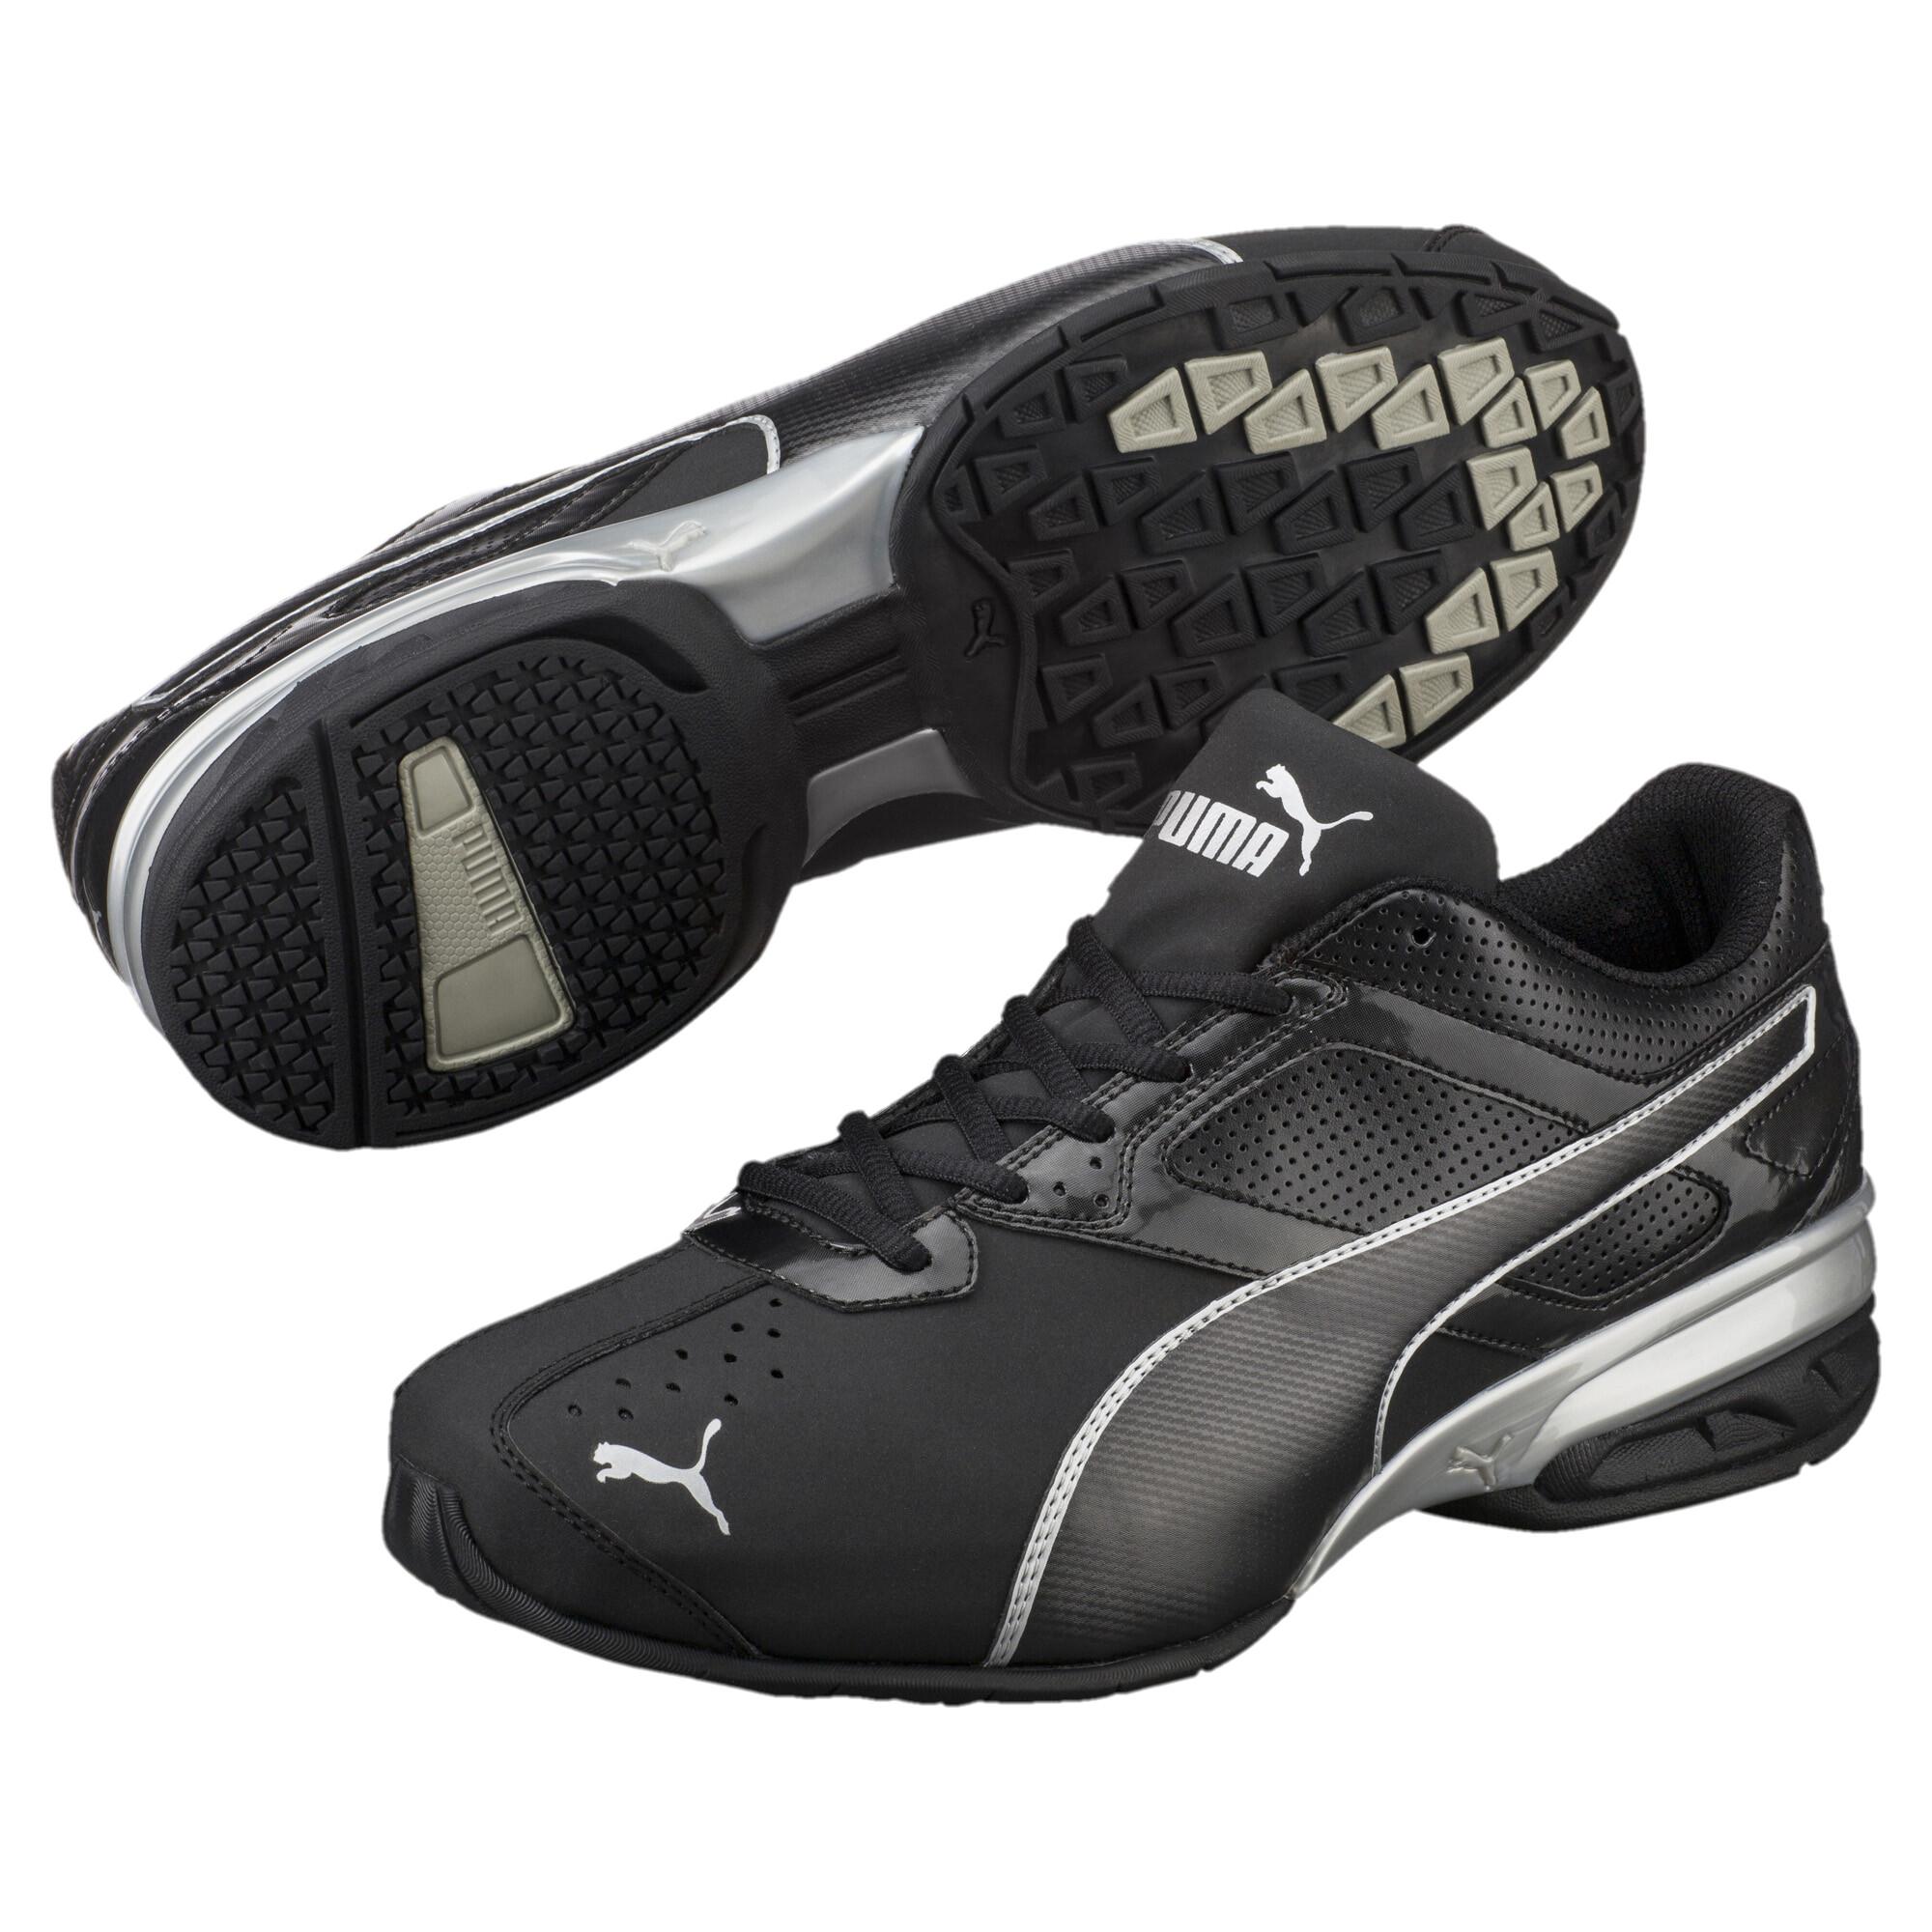 430f870a6 PUMA Tazon 6 FM Wide Men's Sneakers Men Shoe Running. Schließen Weiter